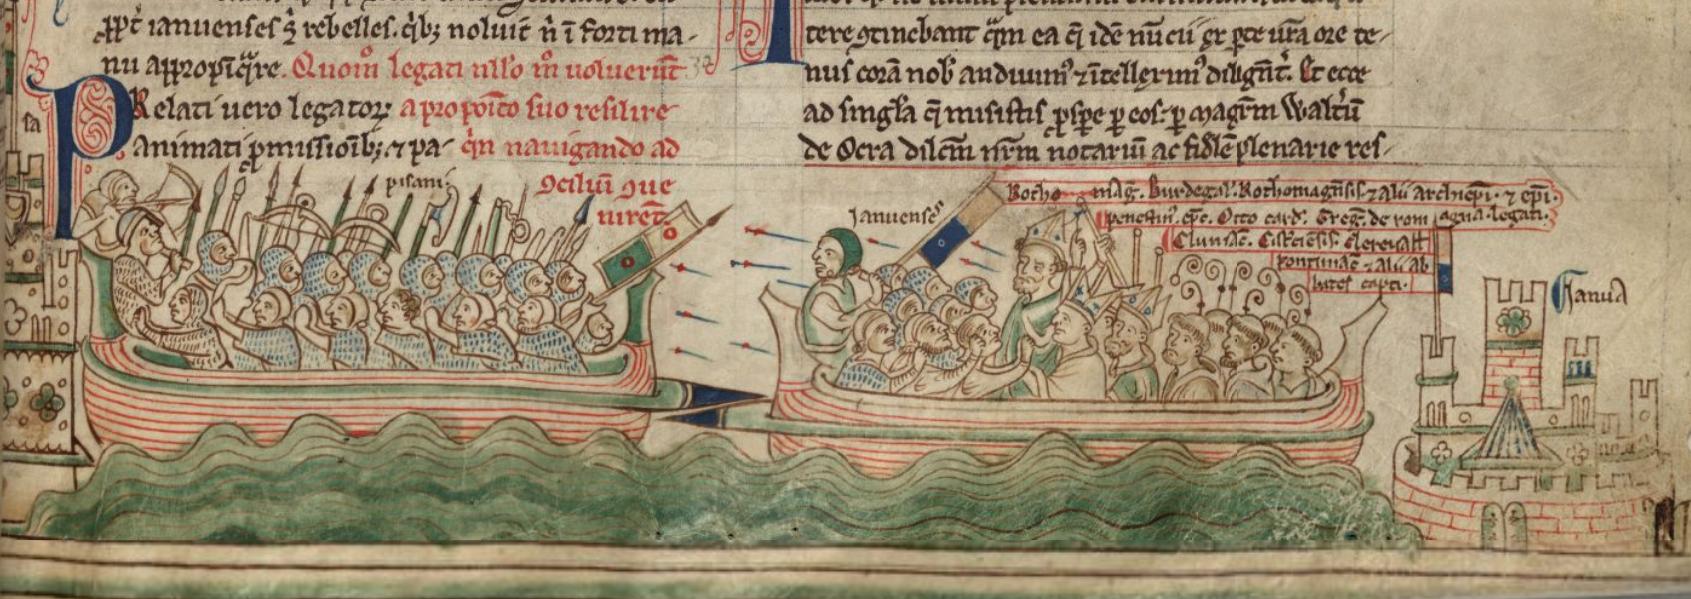 Файл:ChronicaMajora-Giglio1241-MatthewParis-HenryIII(1259).PNG